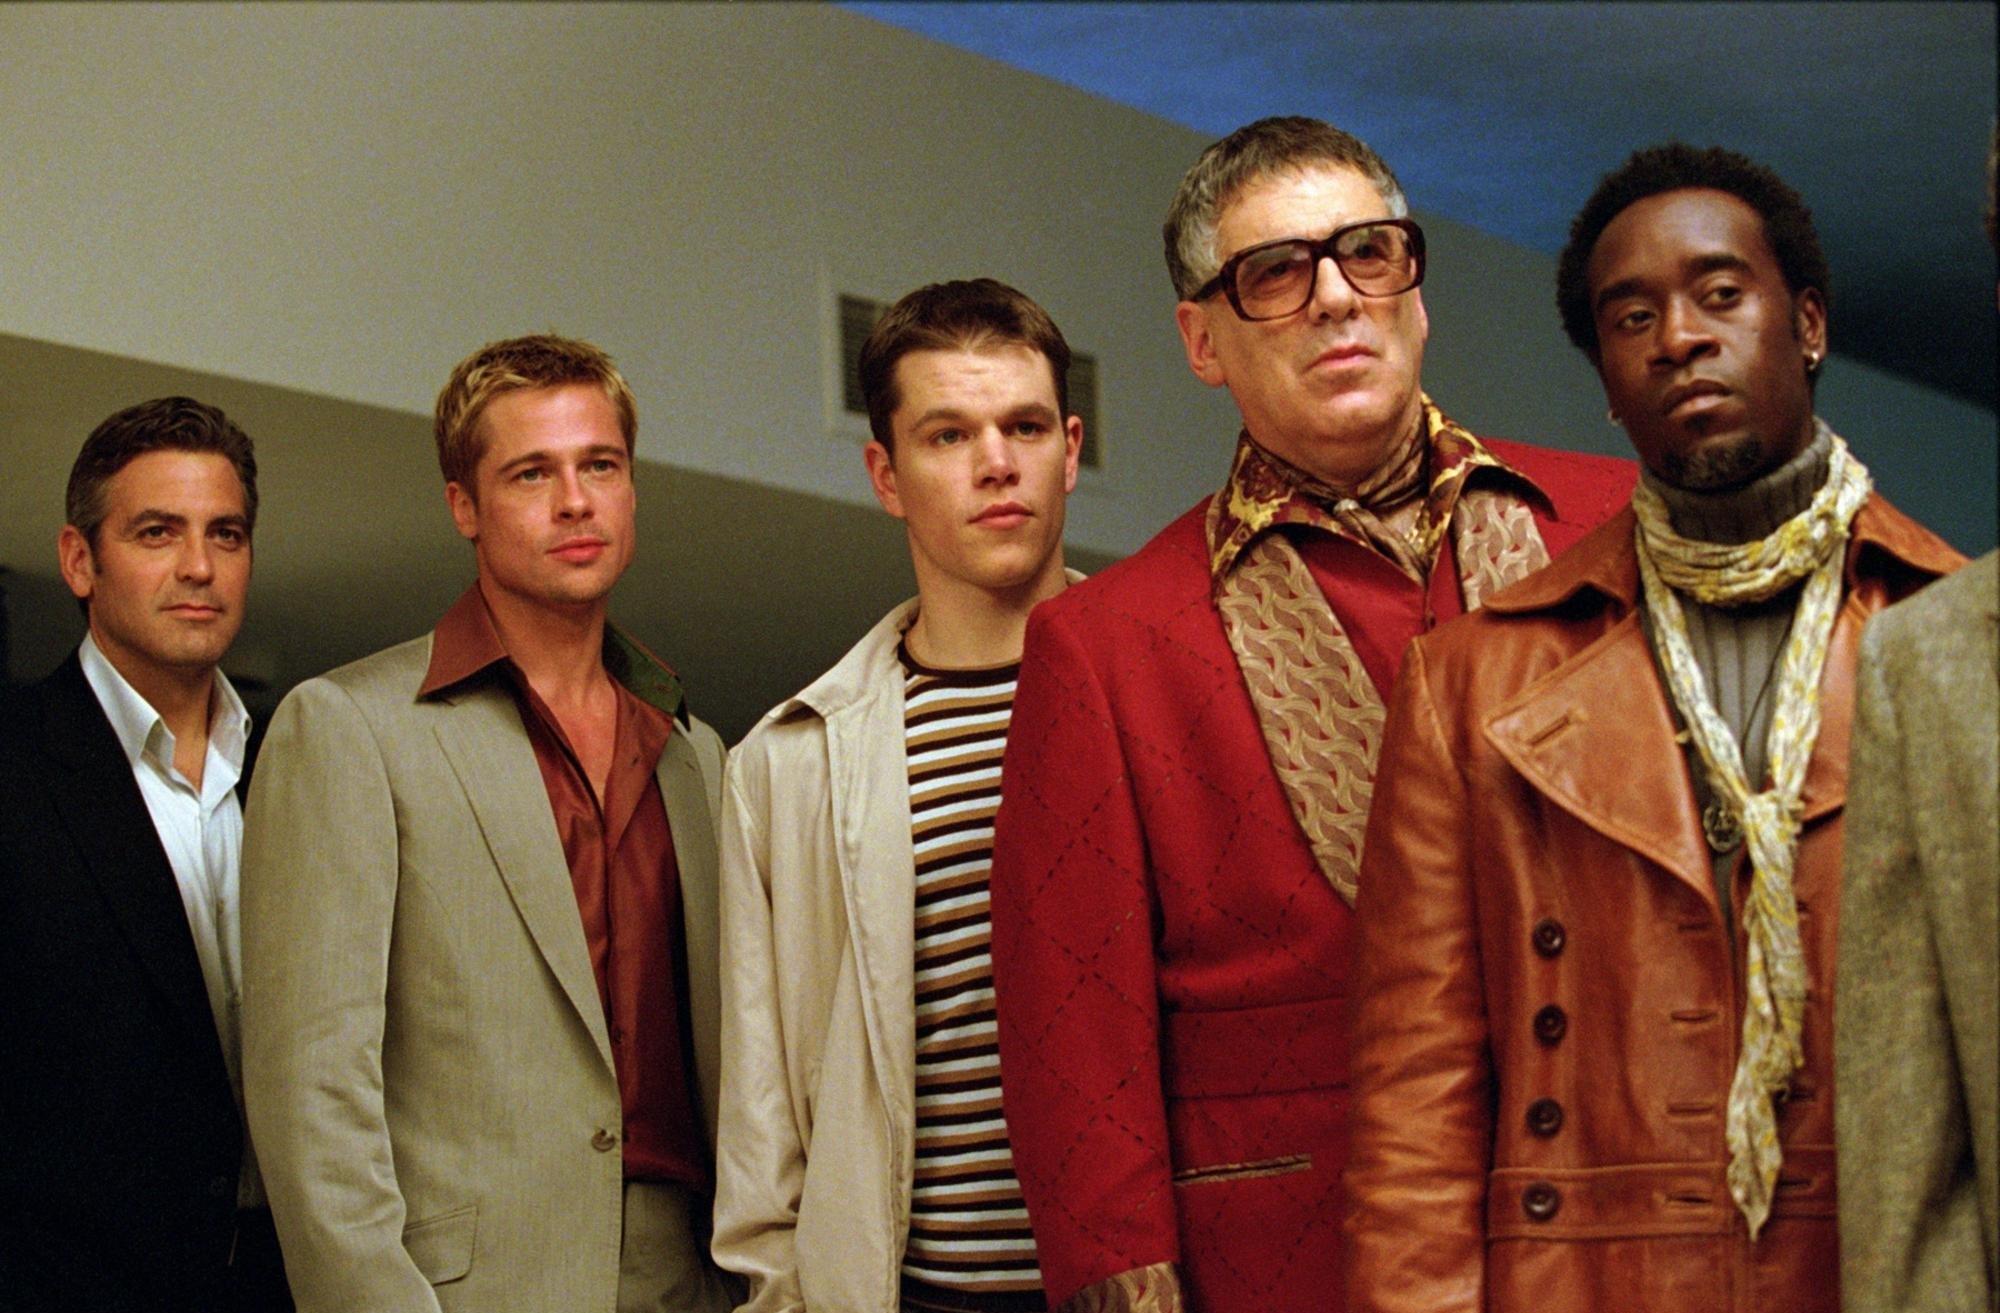 Brad Pitt, George Clooney, Don Cheadle, Matt Damon, and Elliott Gould in Ocean's Eleven (2001)